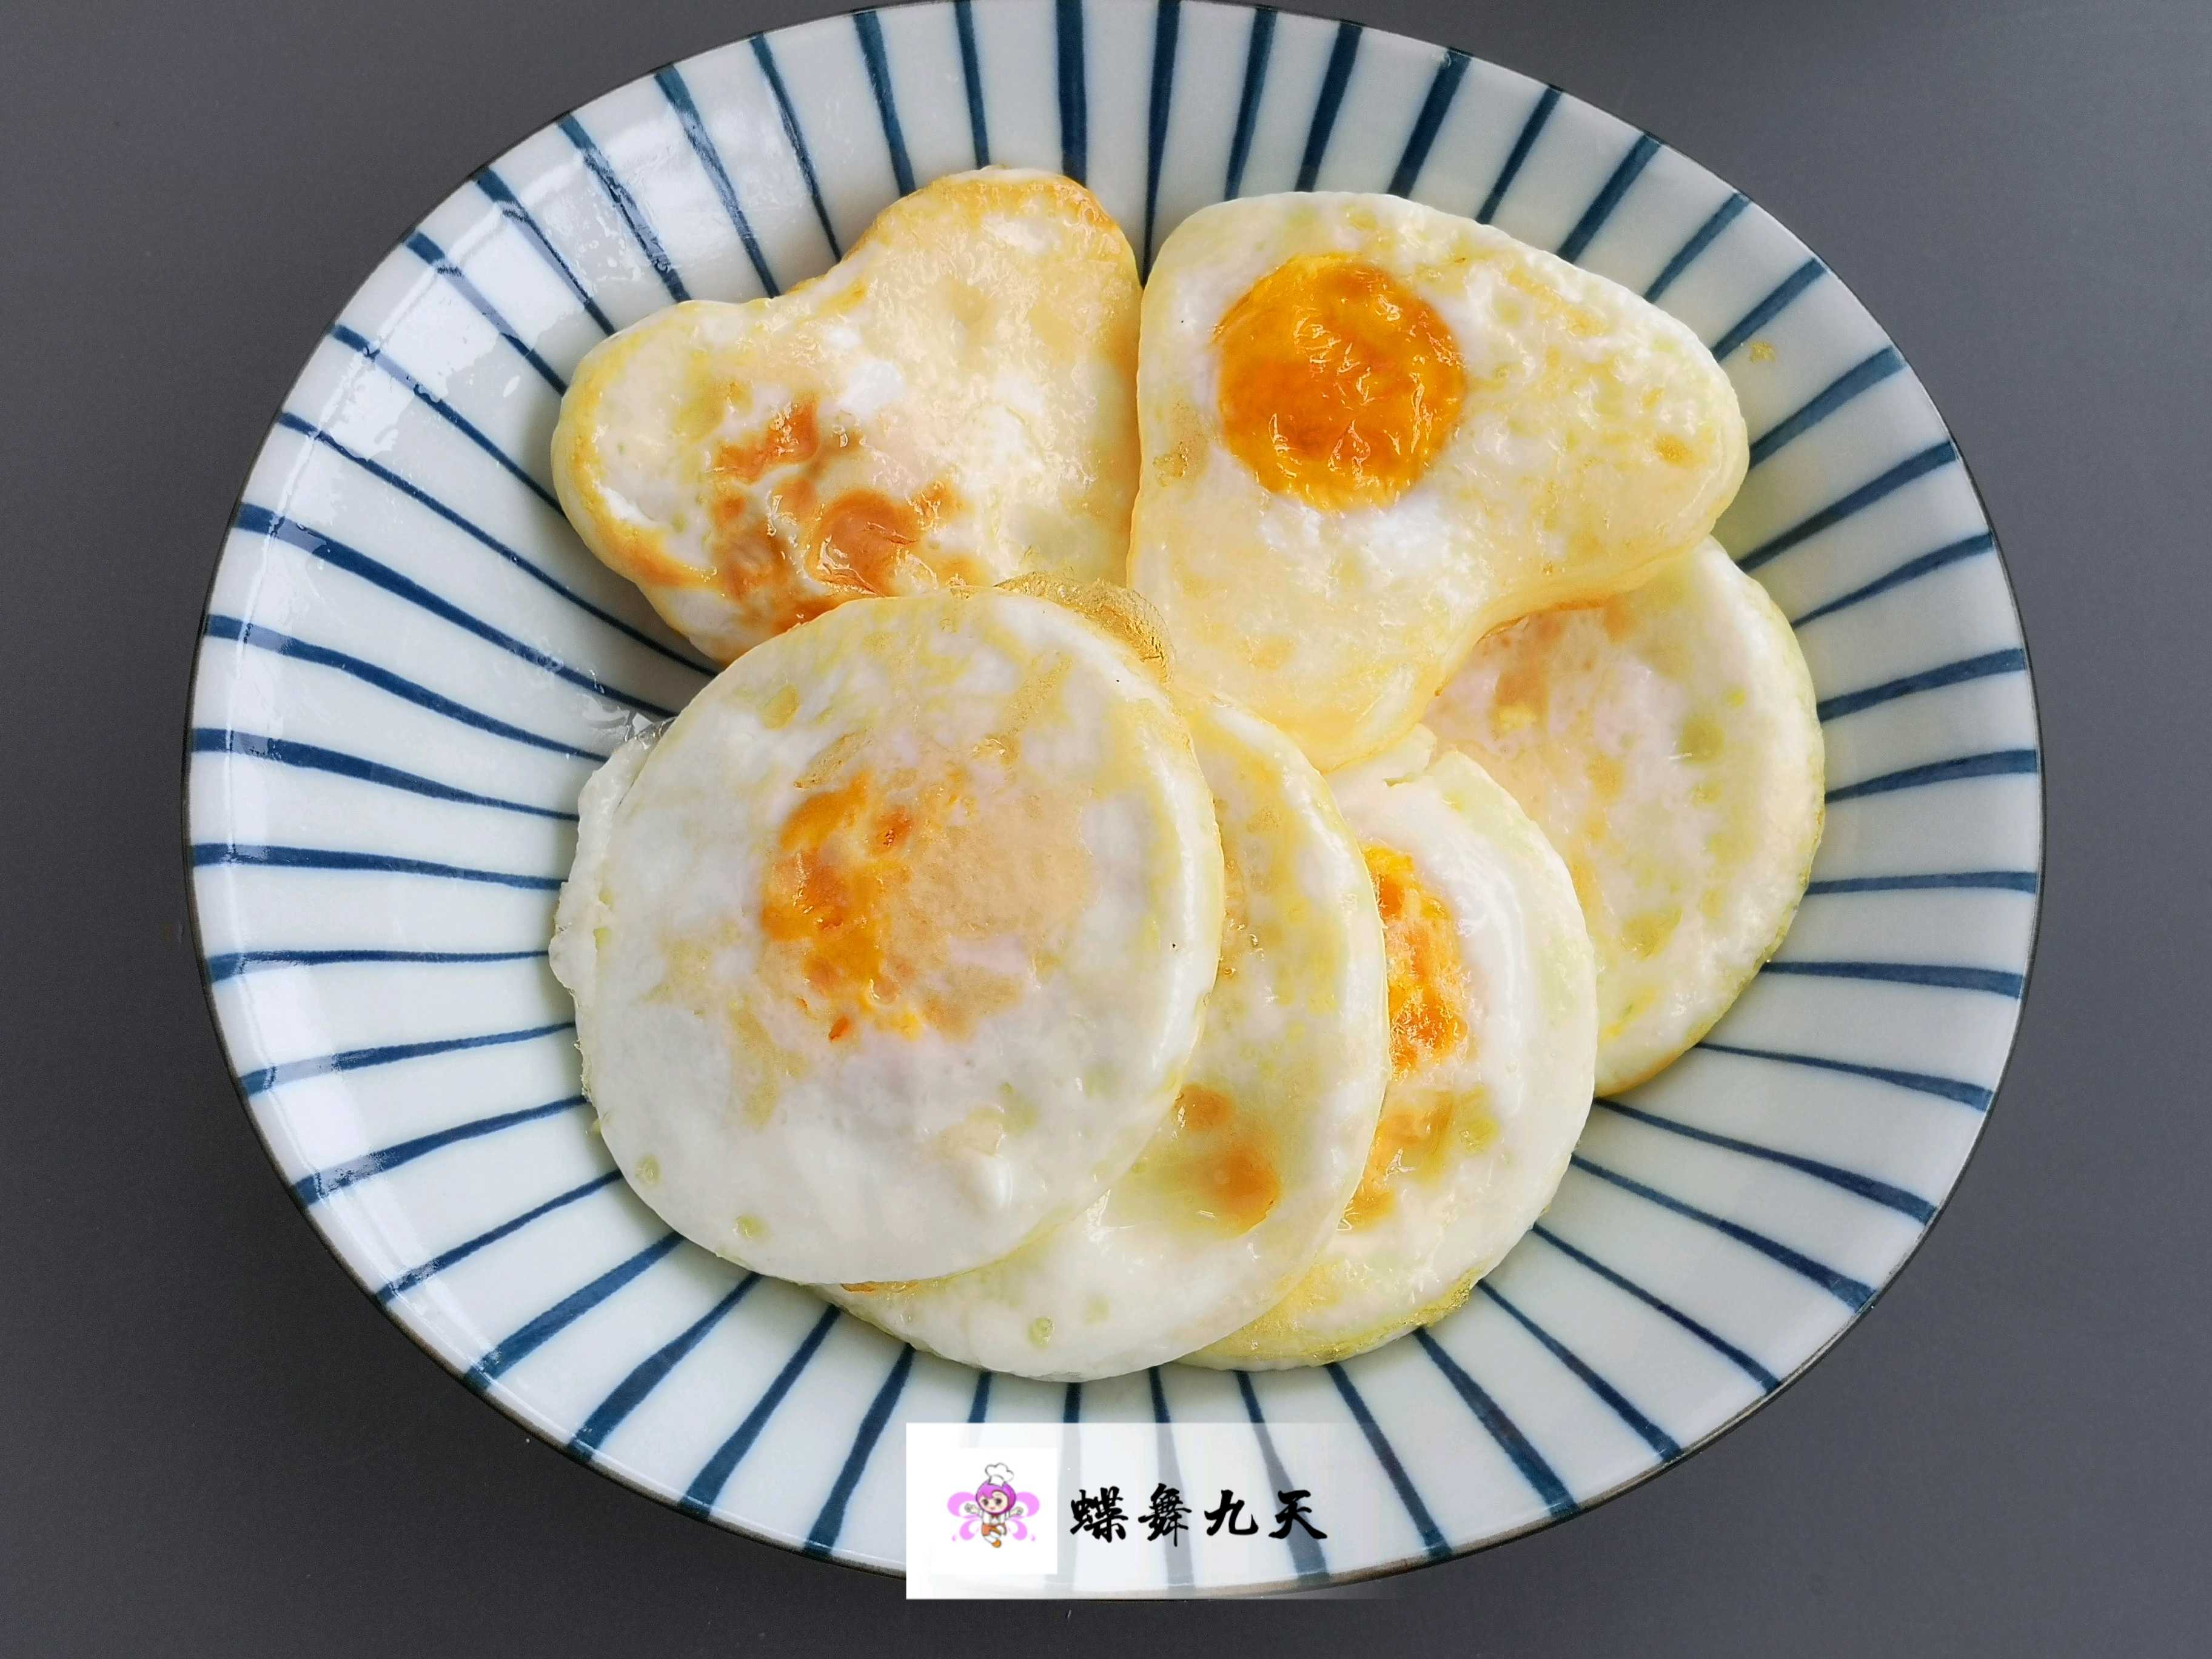 ㊙️鸡蛋这样做,好吃到尖叫‼️糖醋荷包蛋的做法图解